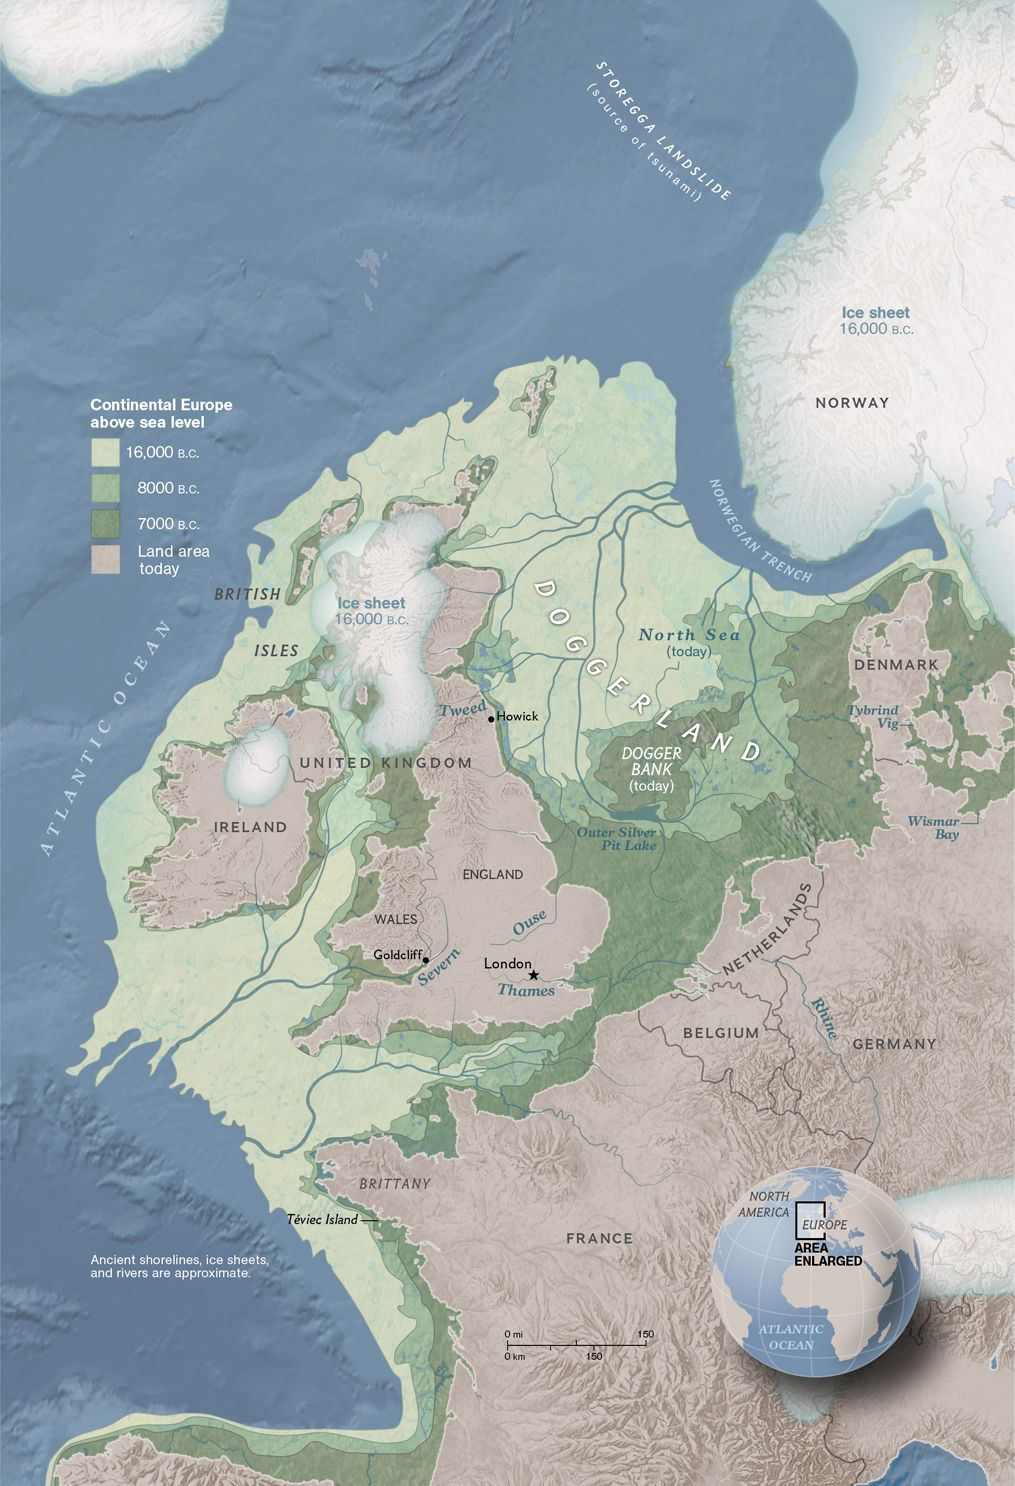 Doggerland Britain and Western Europe Image via